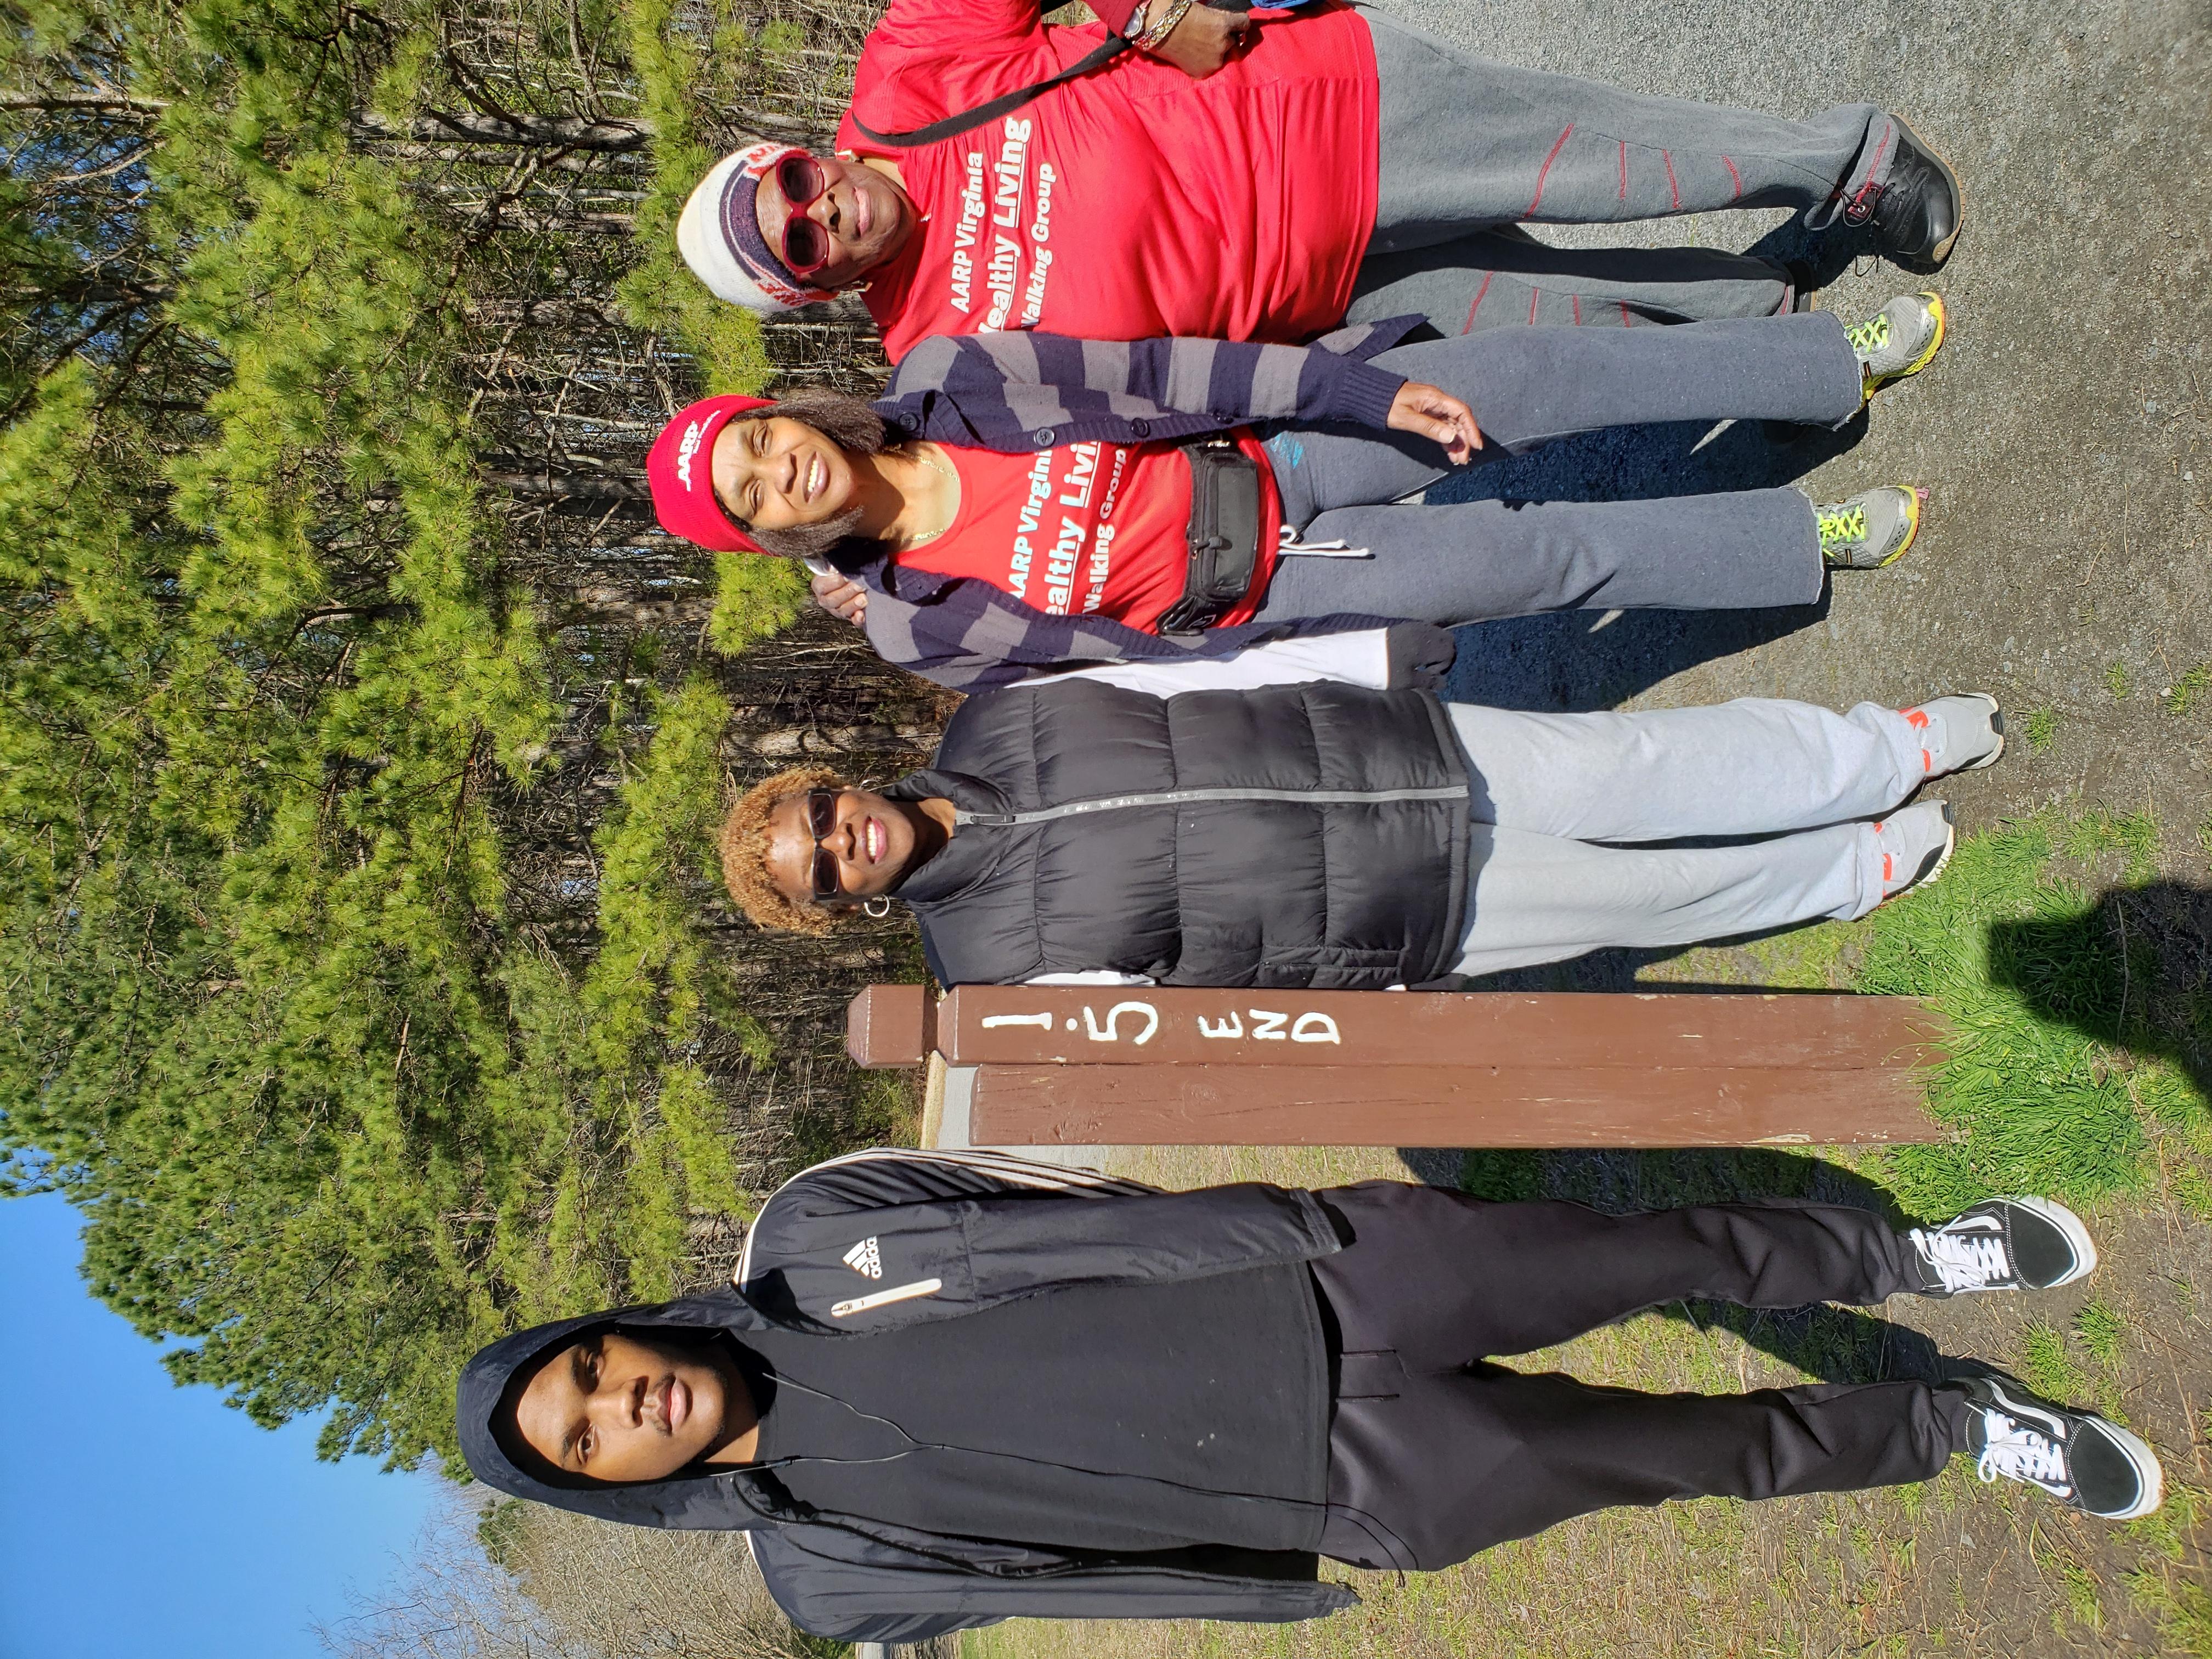 Hampton Roads Walking Group/HR_WalkingGroup 15.jpg